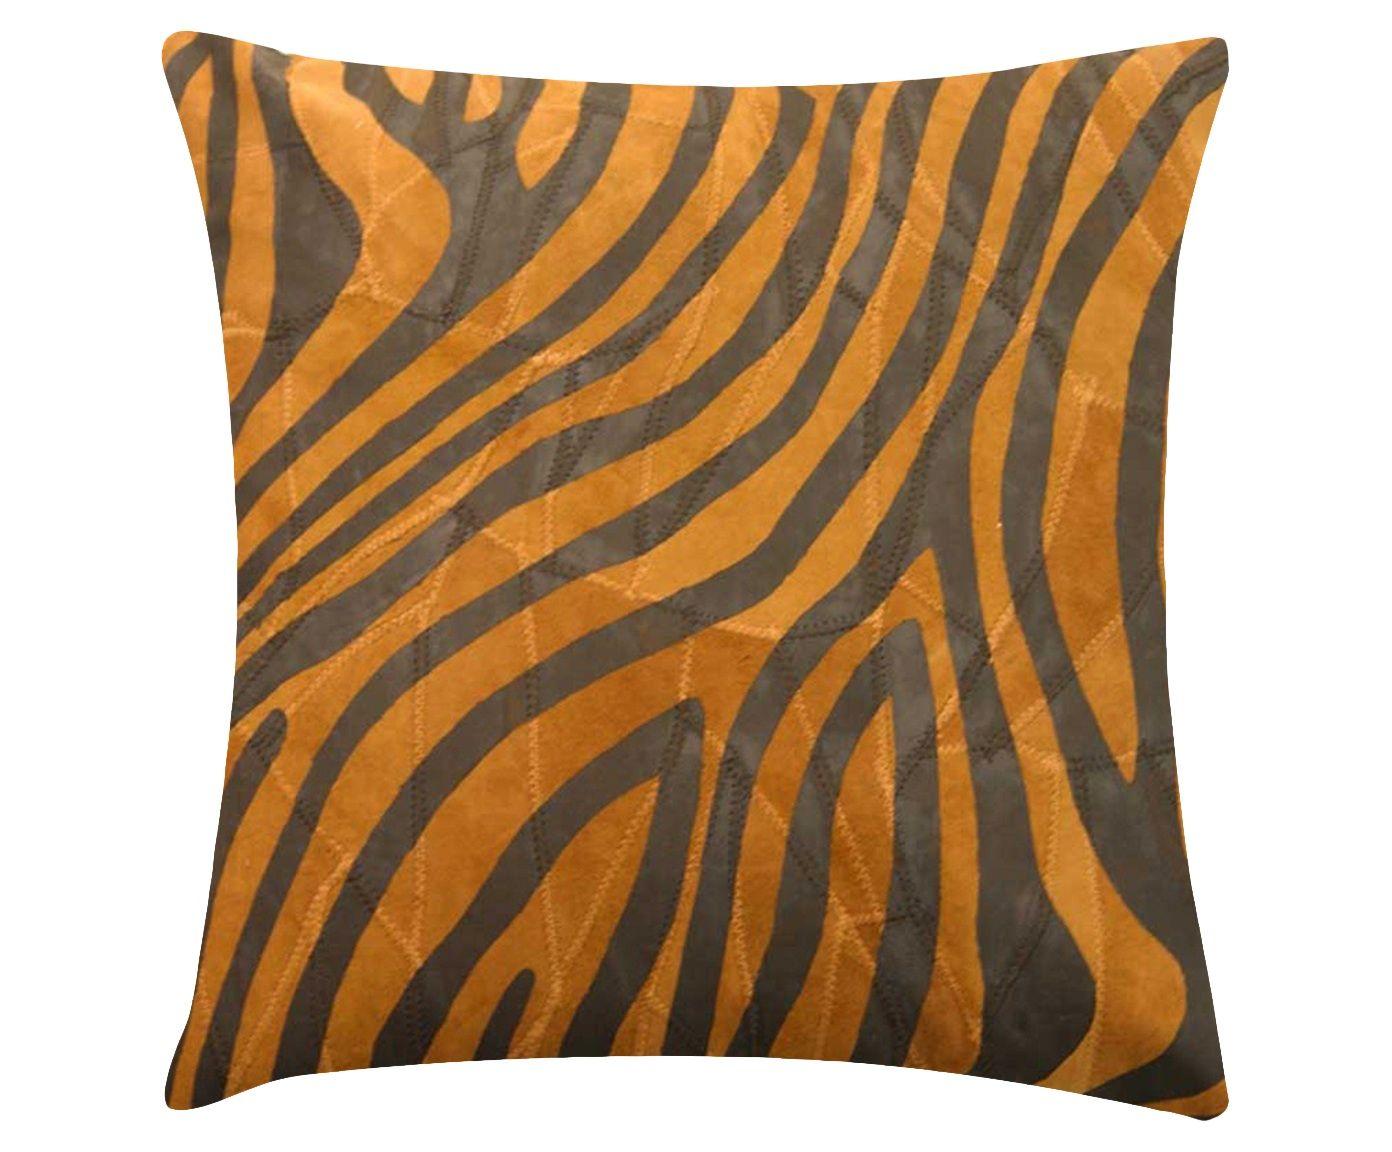 Capa para almofada tigre - 40x40cm   Westwing.com.br